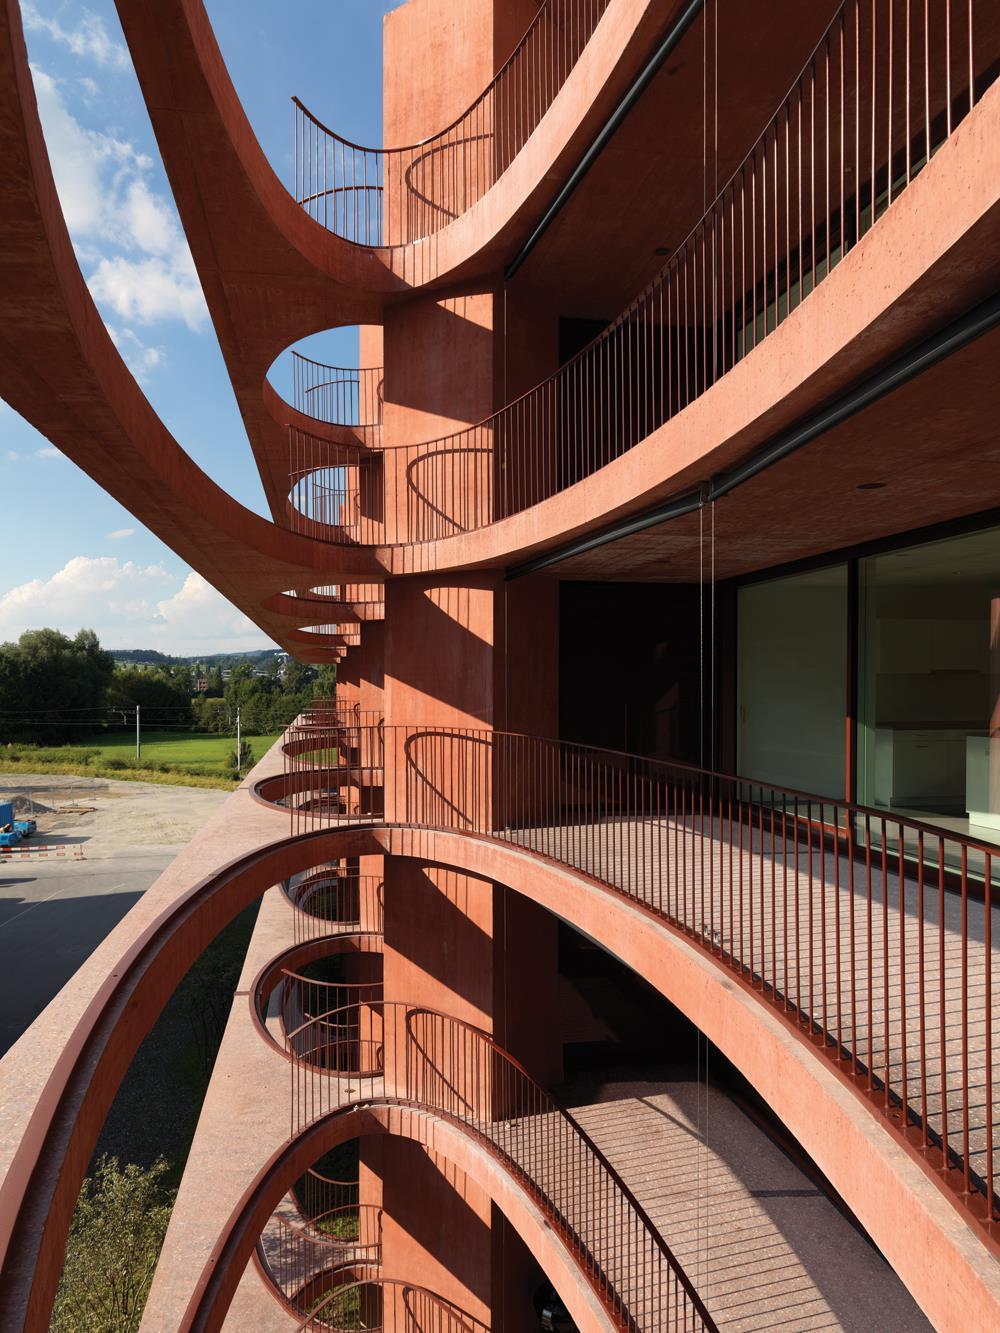 Zug Schleife Apartments By Valerio Olgiati Building